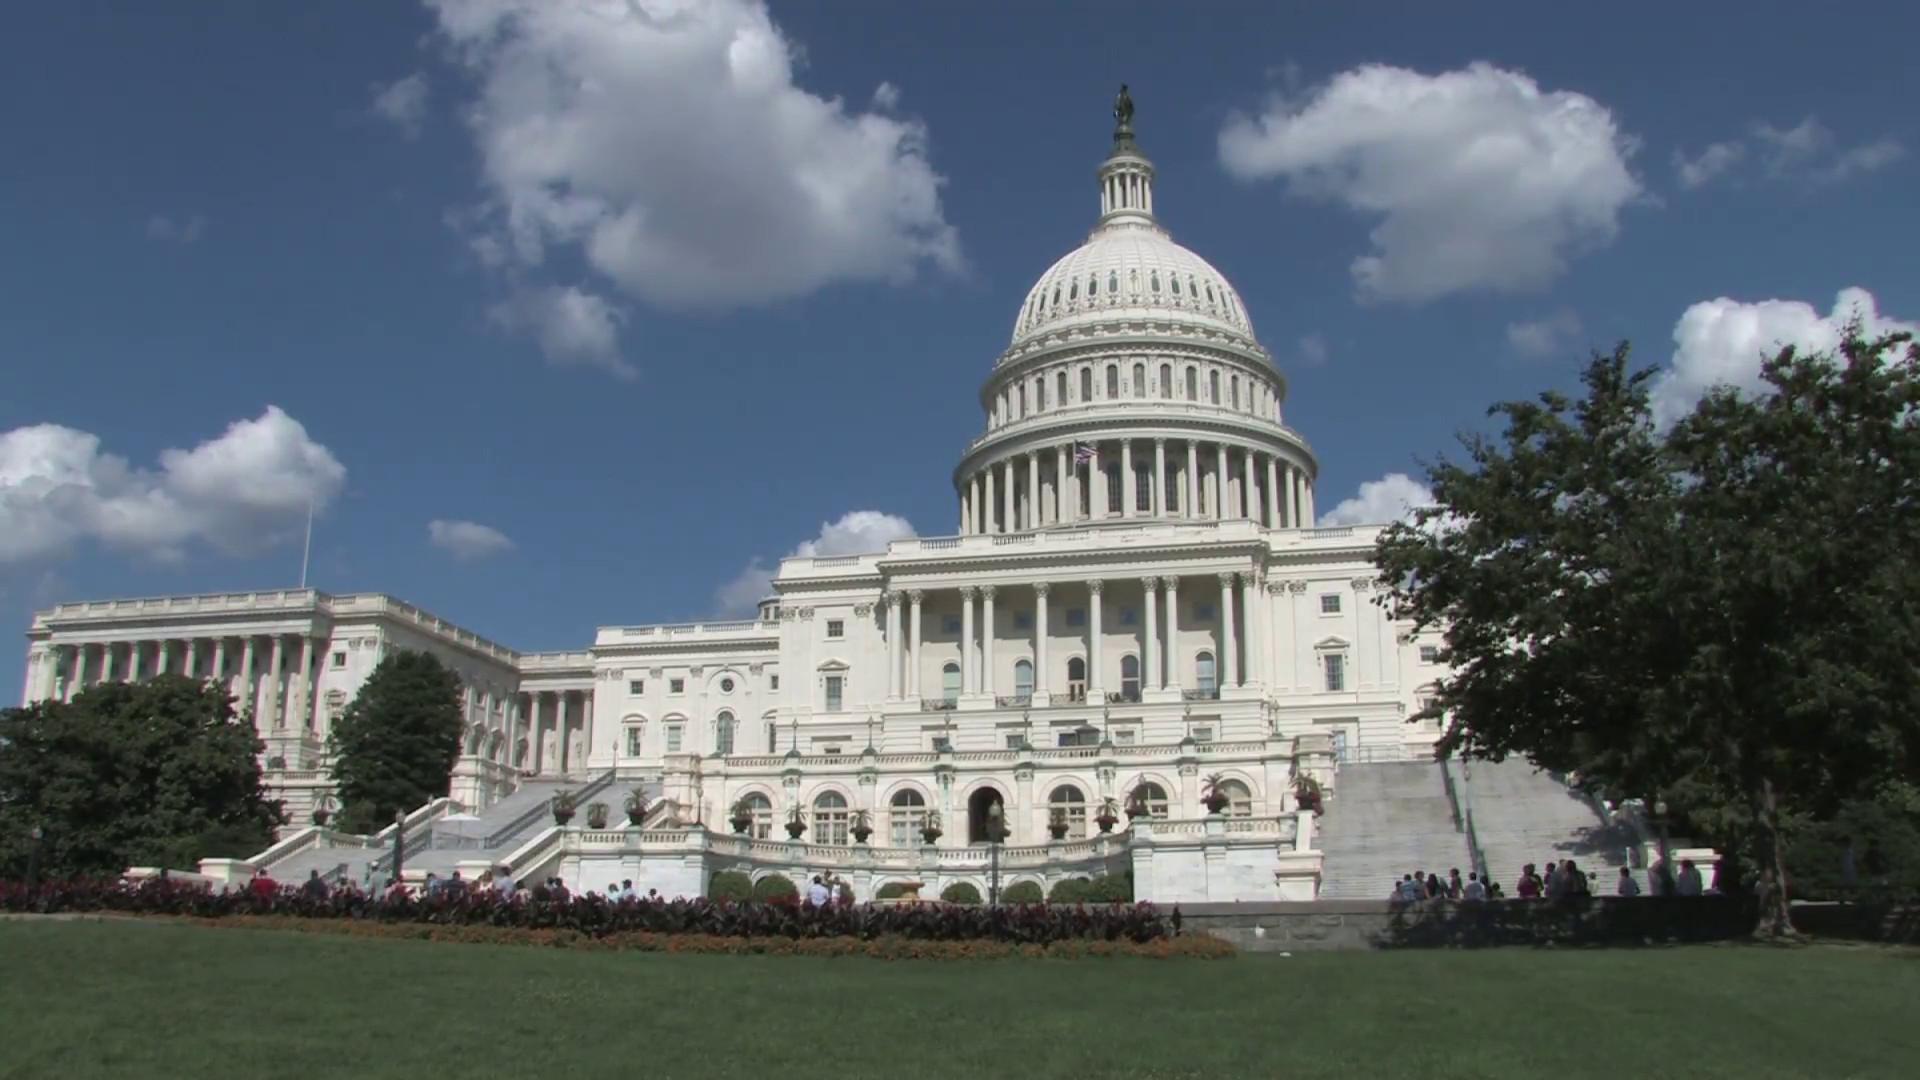 HD Washington DC Washington Capitol 4 Stock Video Footage – VideoBlocks